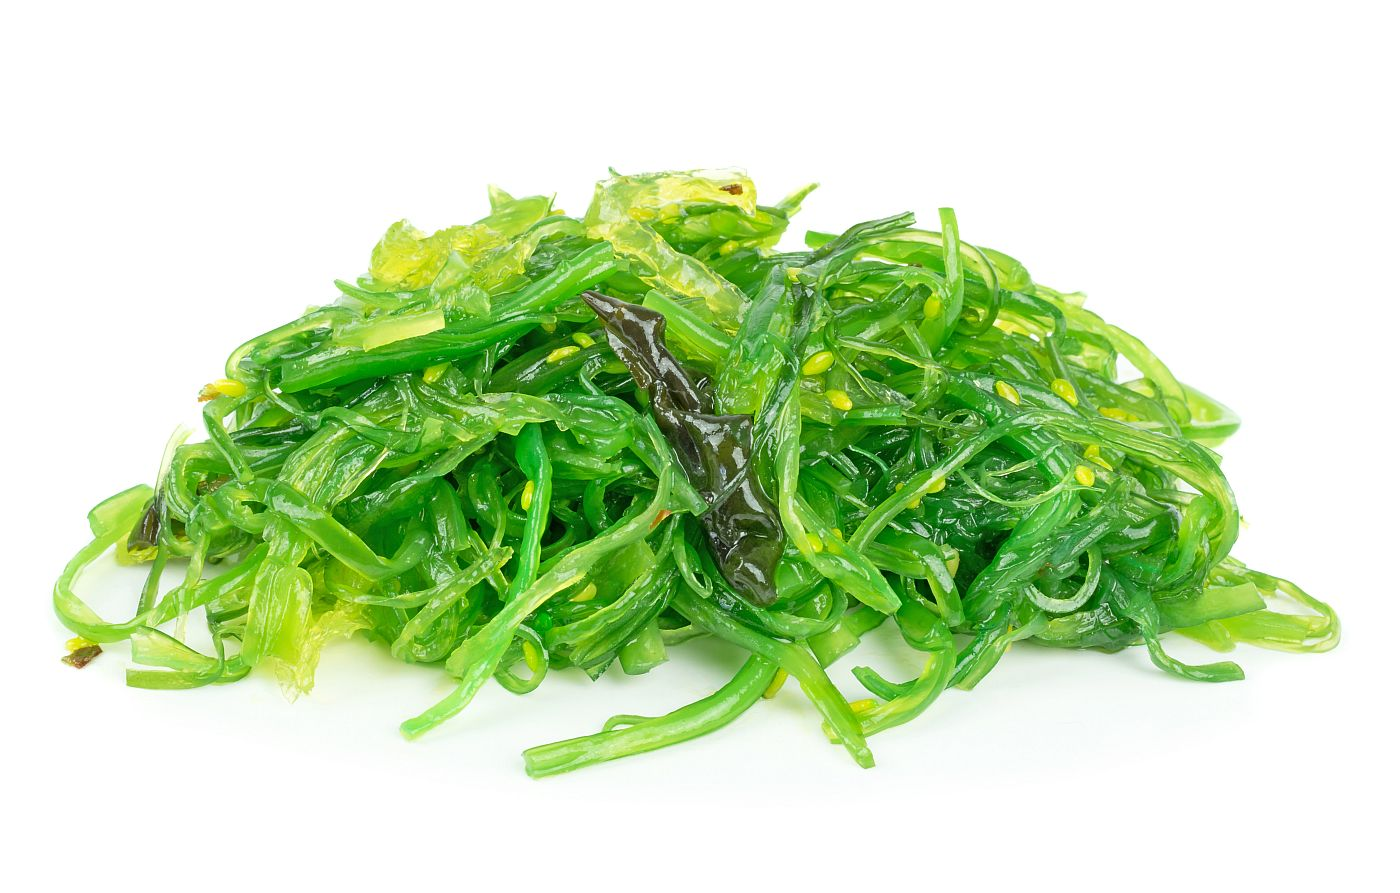 Algenöl als vegane Omega-3 Quelle